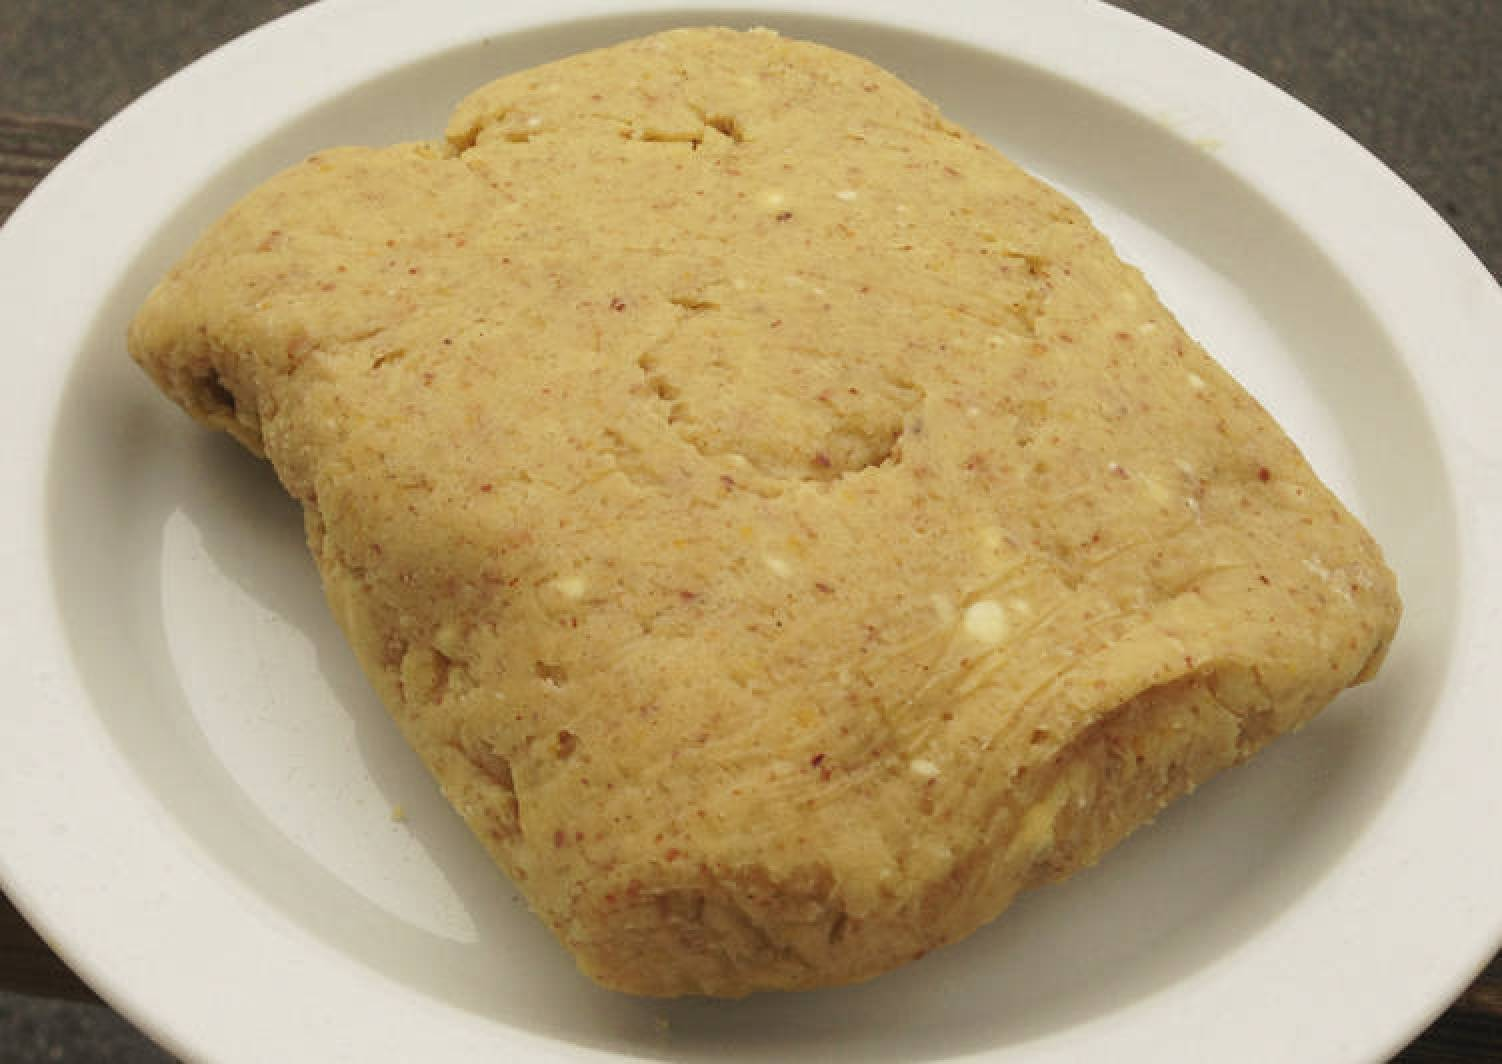 Orange Cardamom Nut Tart Crust FUSF